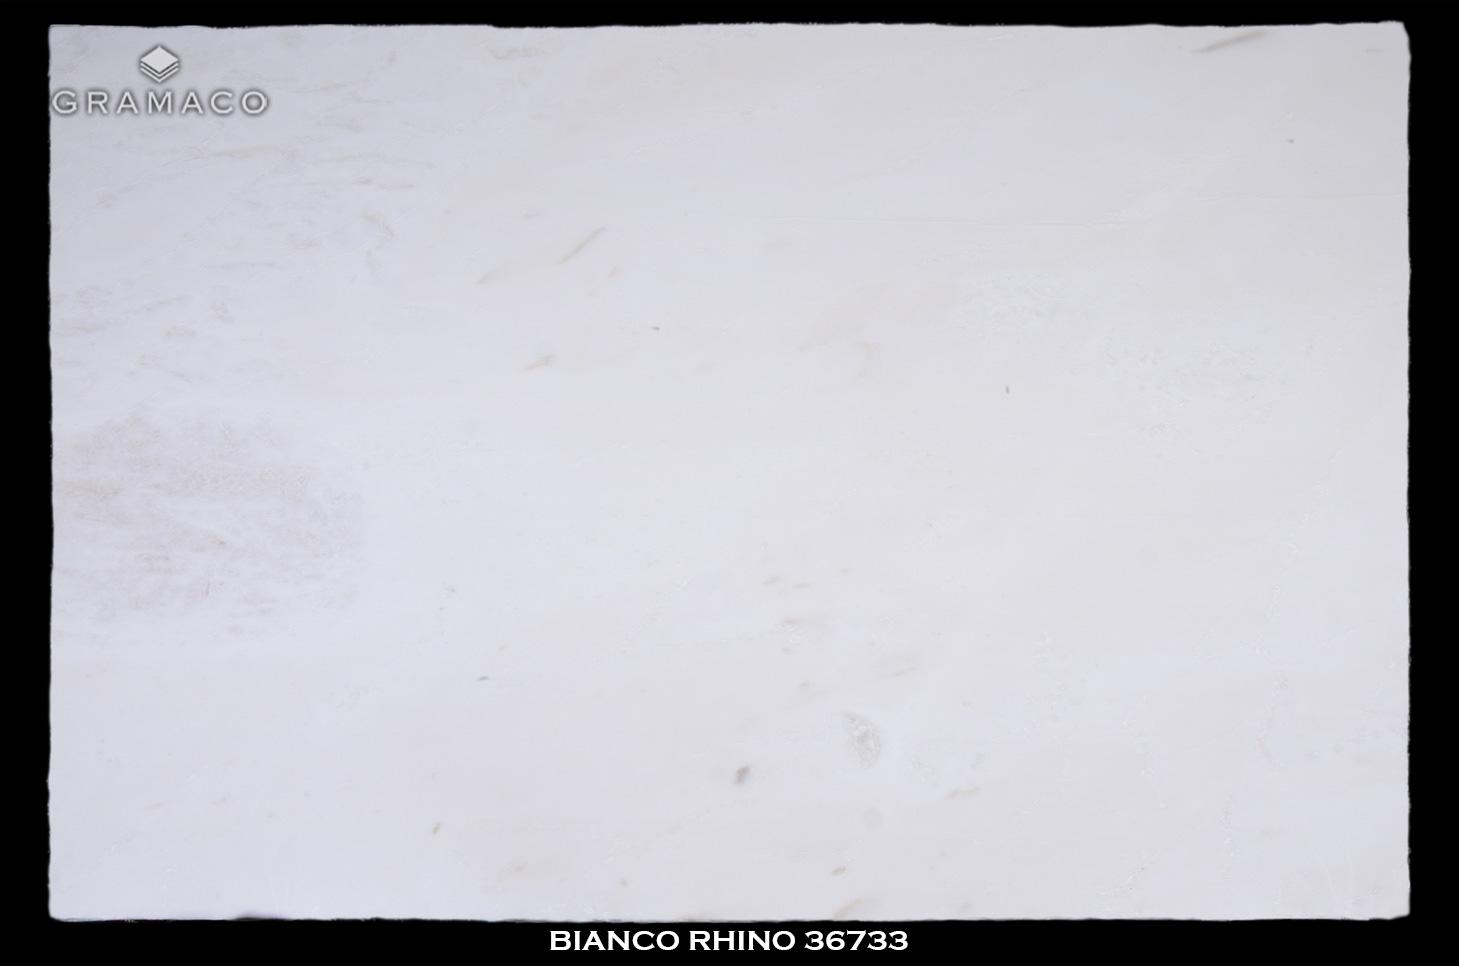 BIANCO-RHINO-36733